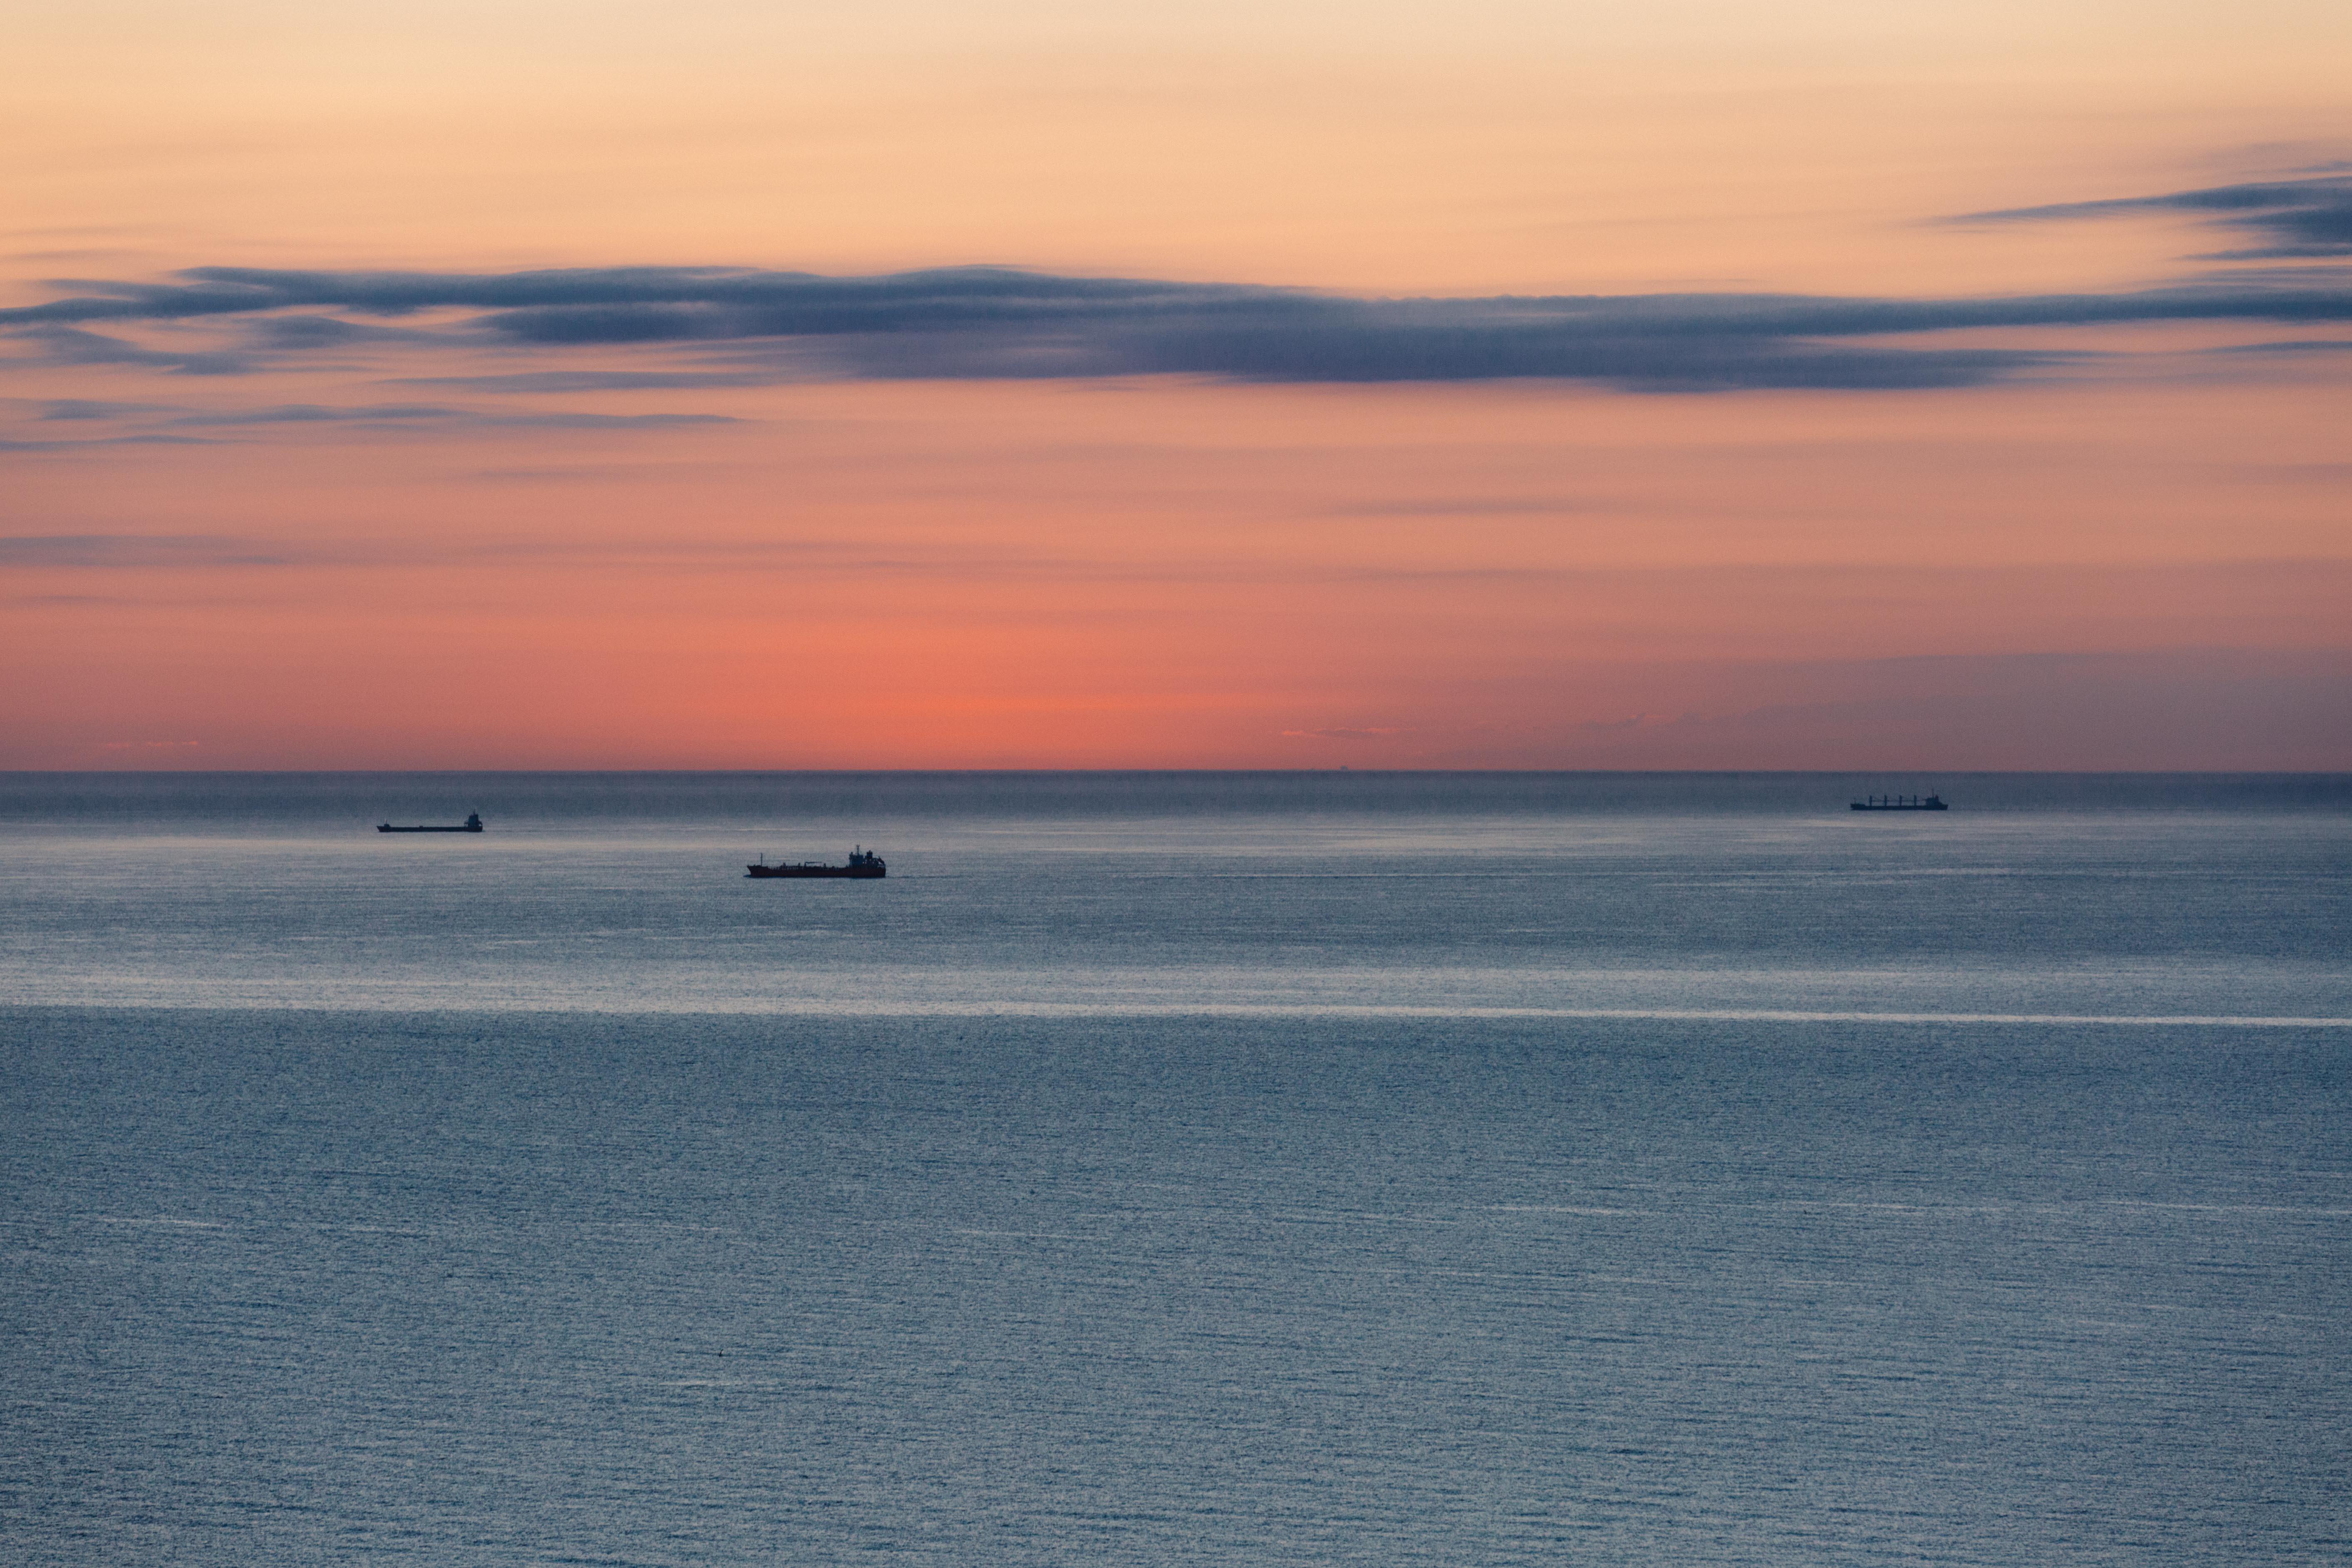 Robin Hoods Bay Seascape Photography